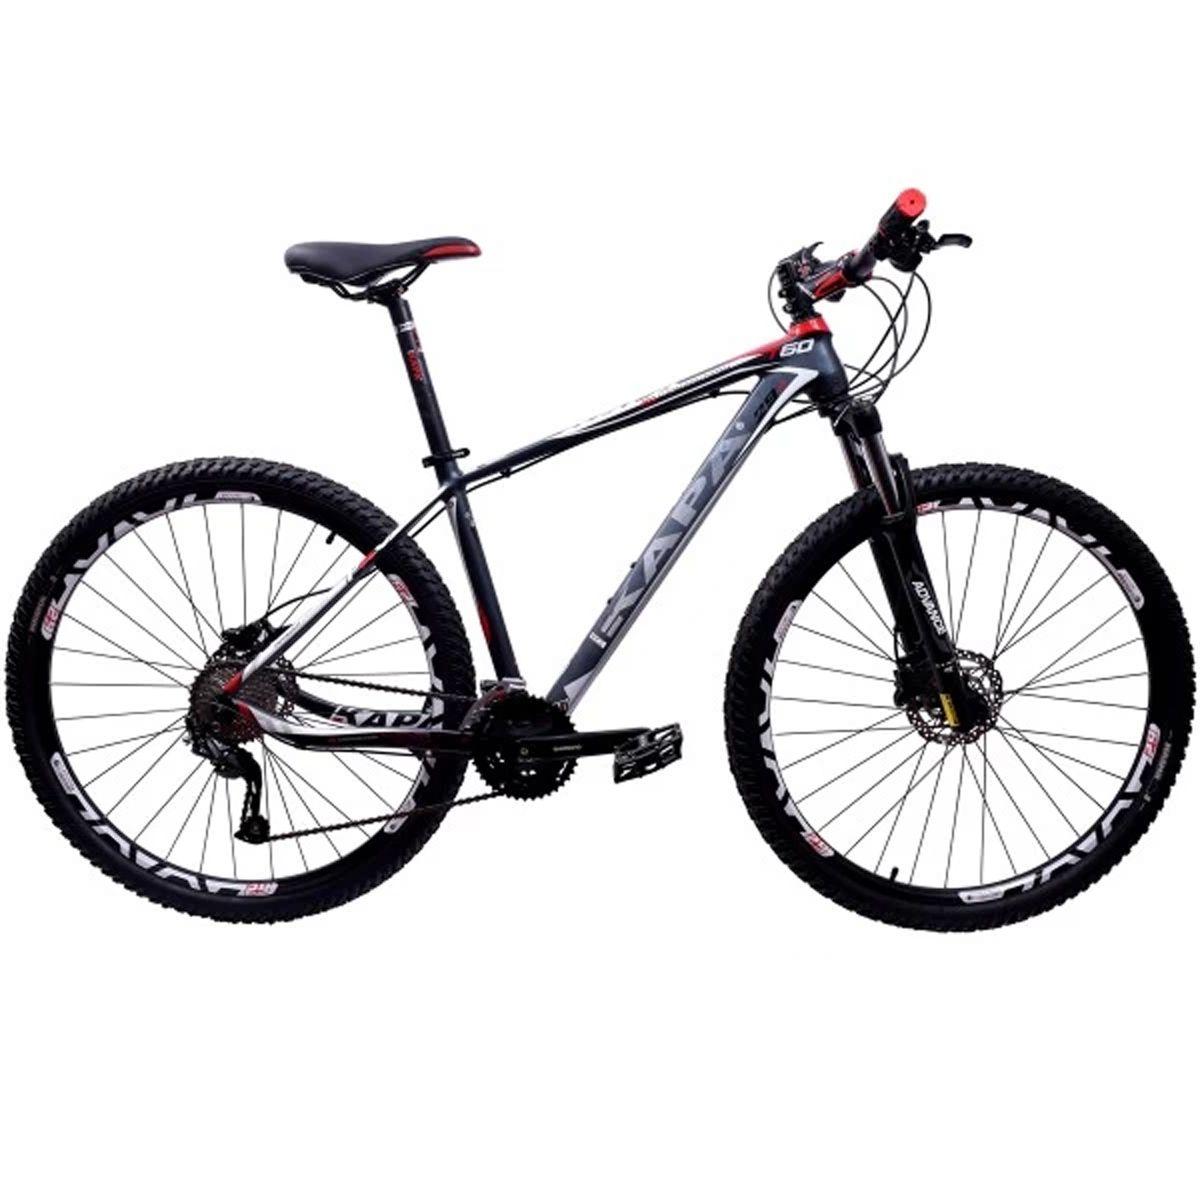 Bicicleta 29 Kapa T-60 Shimano Altus 27v Tamanho 17.5 Cinza